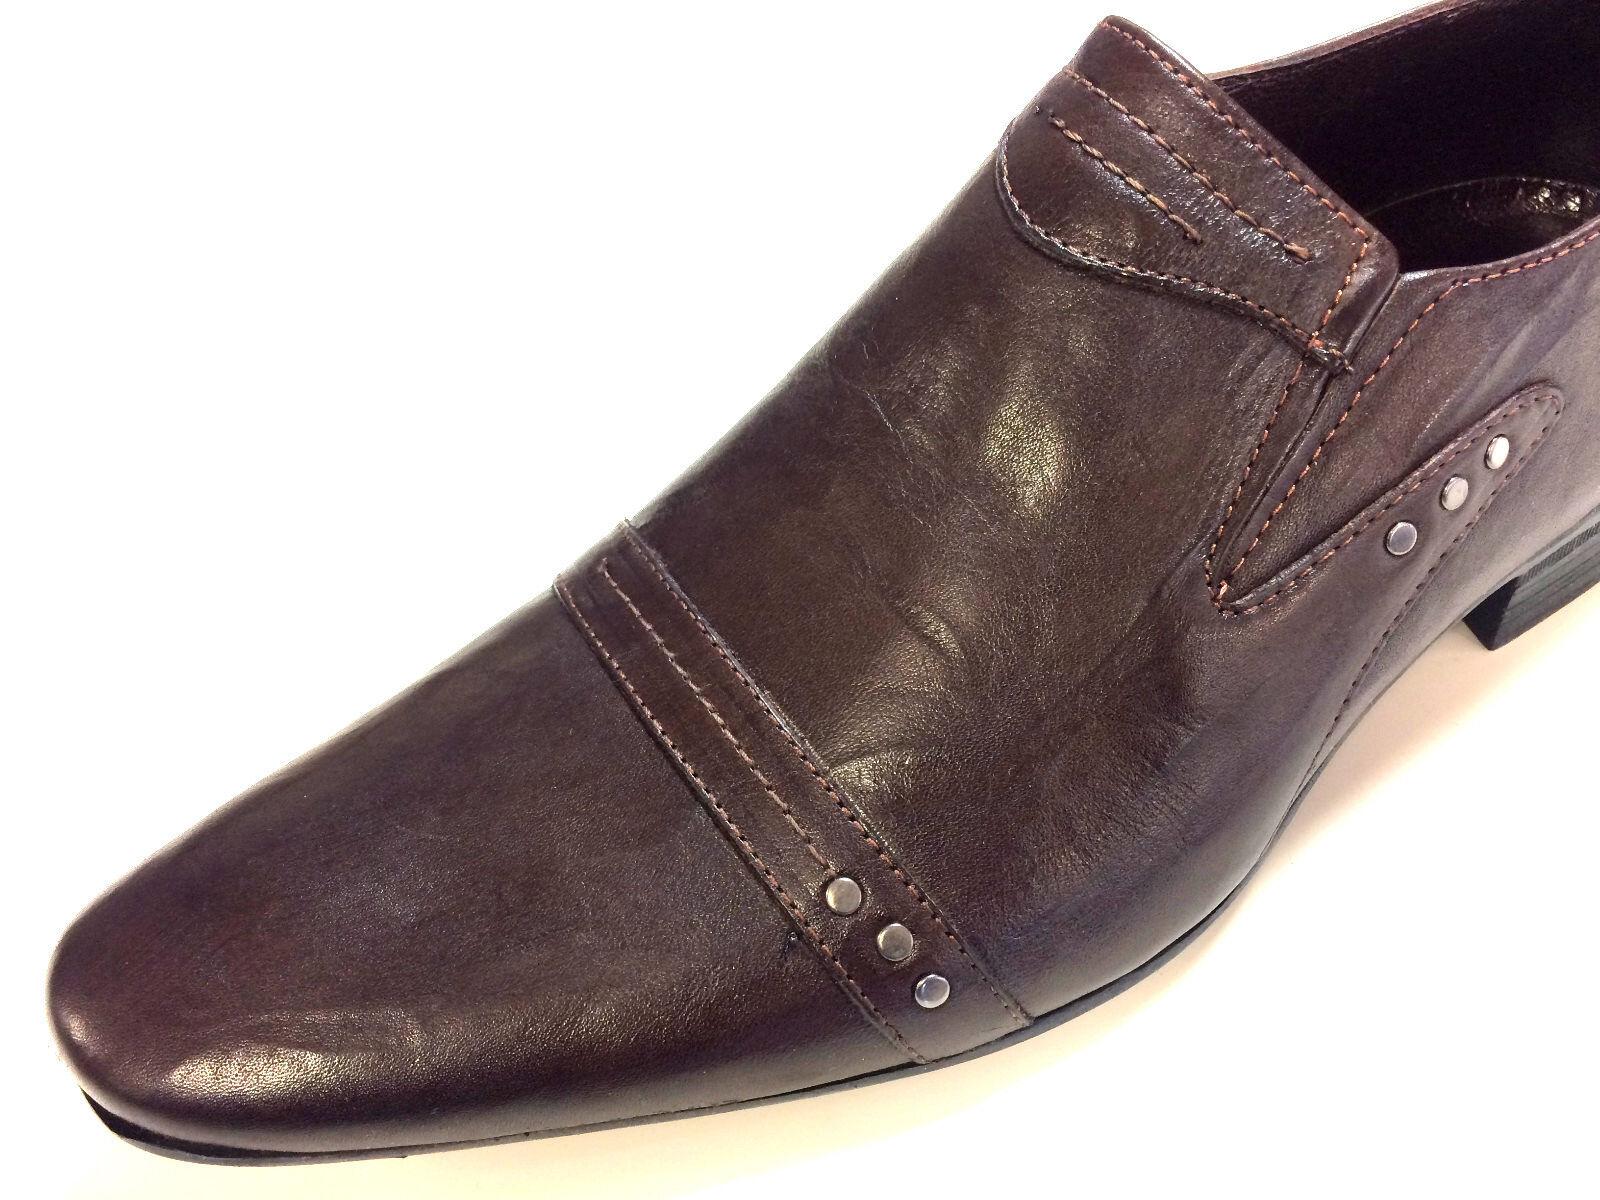 Chelsy cuero zapatos caballero mocasín Designer vernietet Slipper a mano marrón